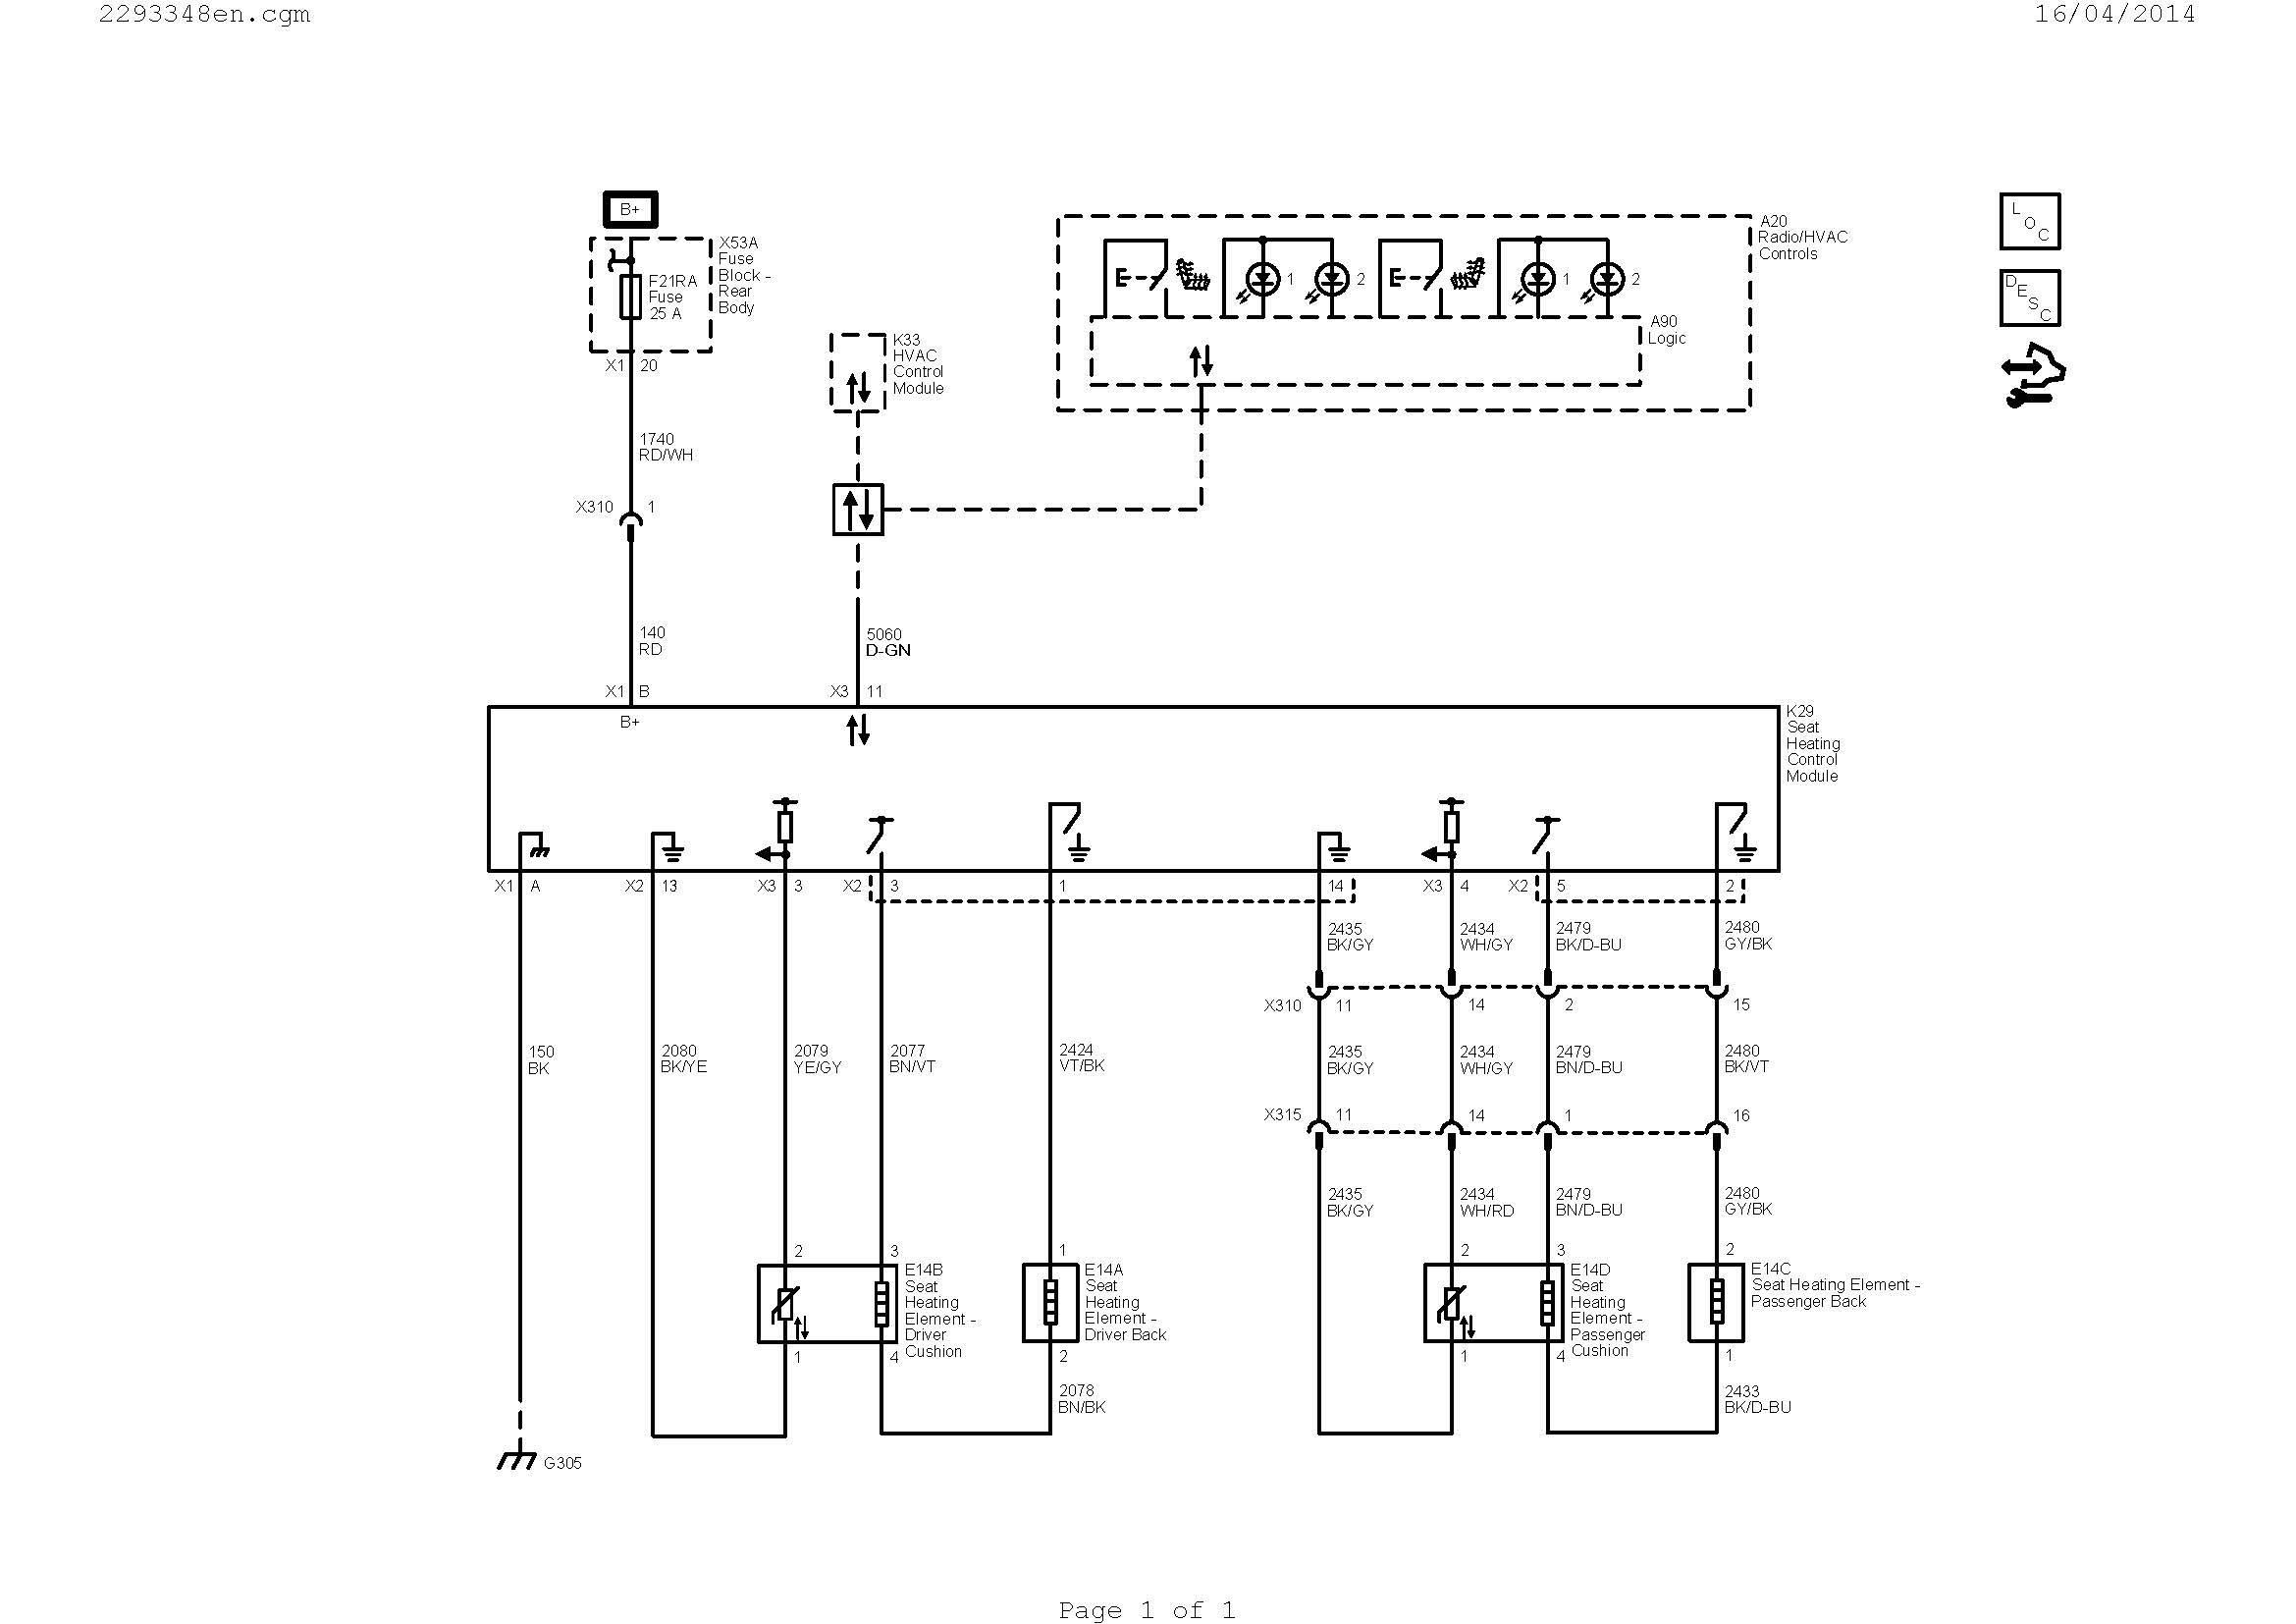 phone wiring diagram Download-Electrical Wiring Diagrams New Phone Wiring Diagram New Best Wiring Diagram Od Rv Park Electrical 15-p